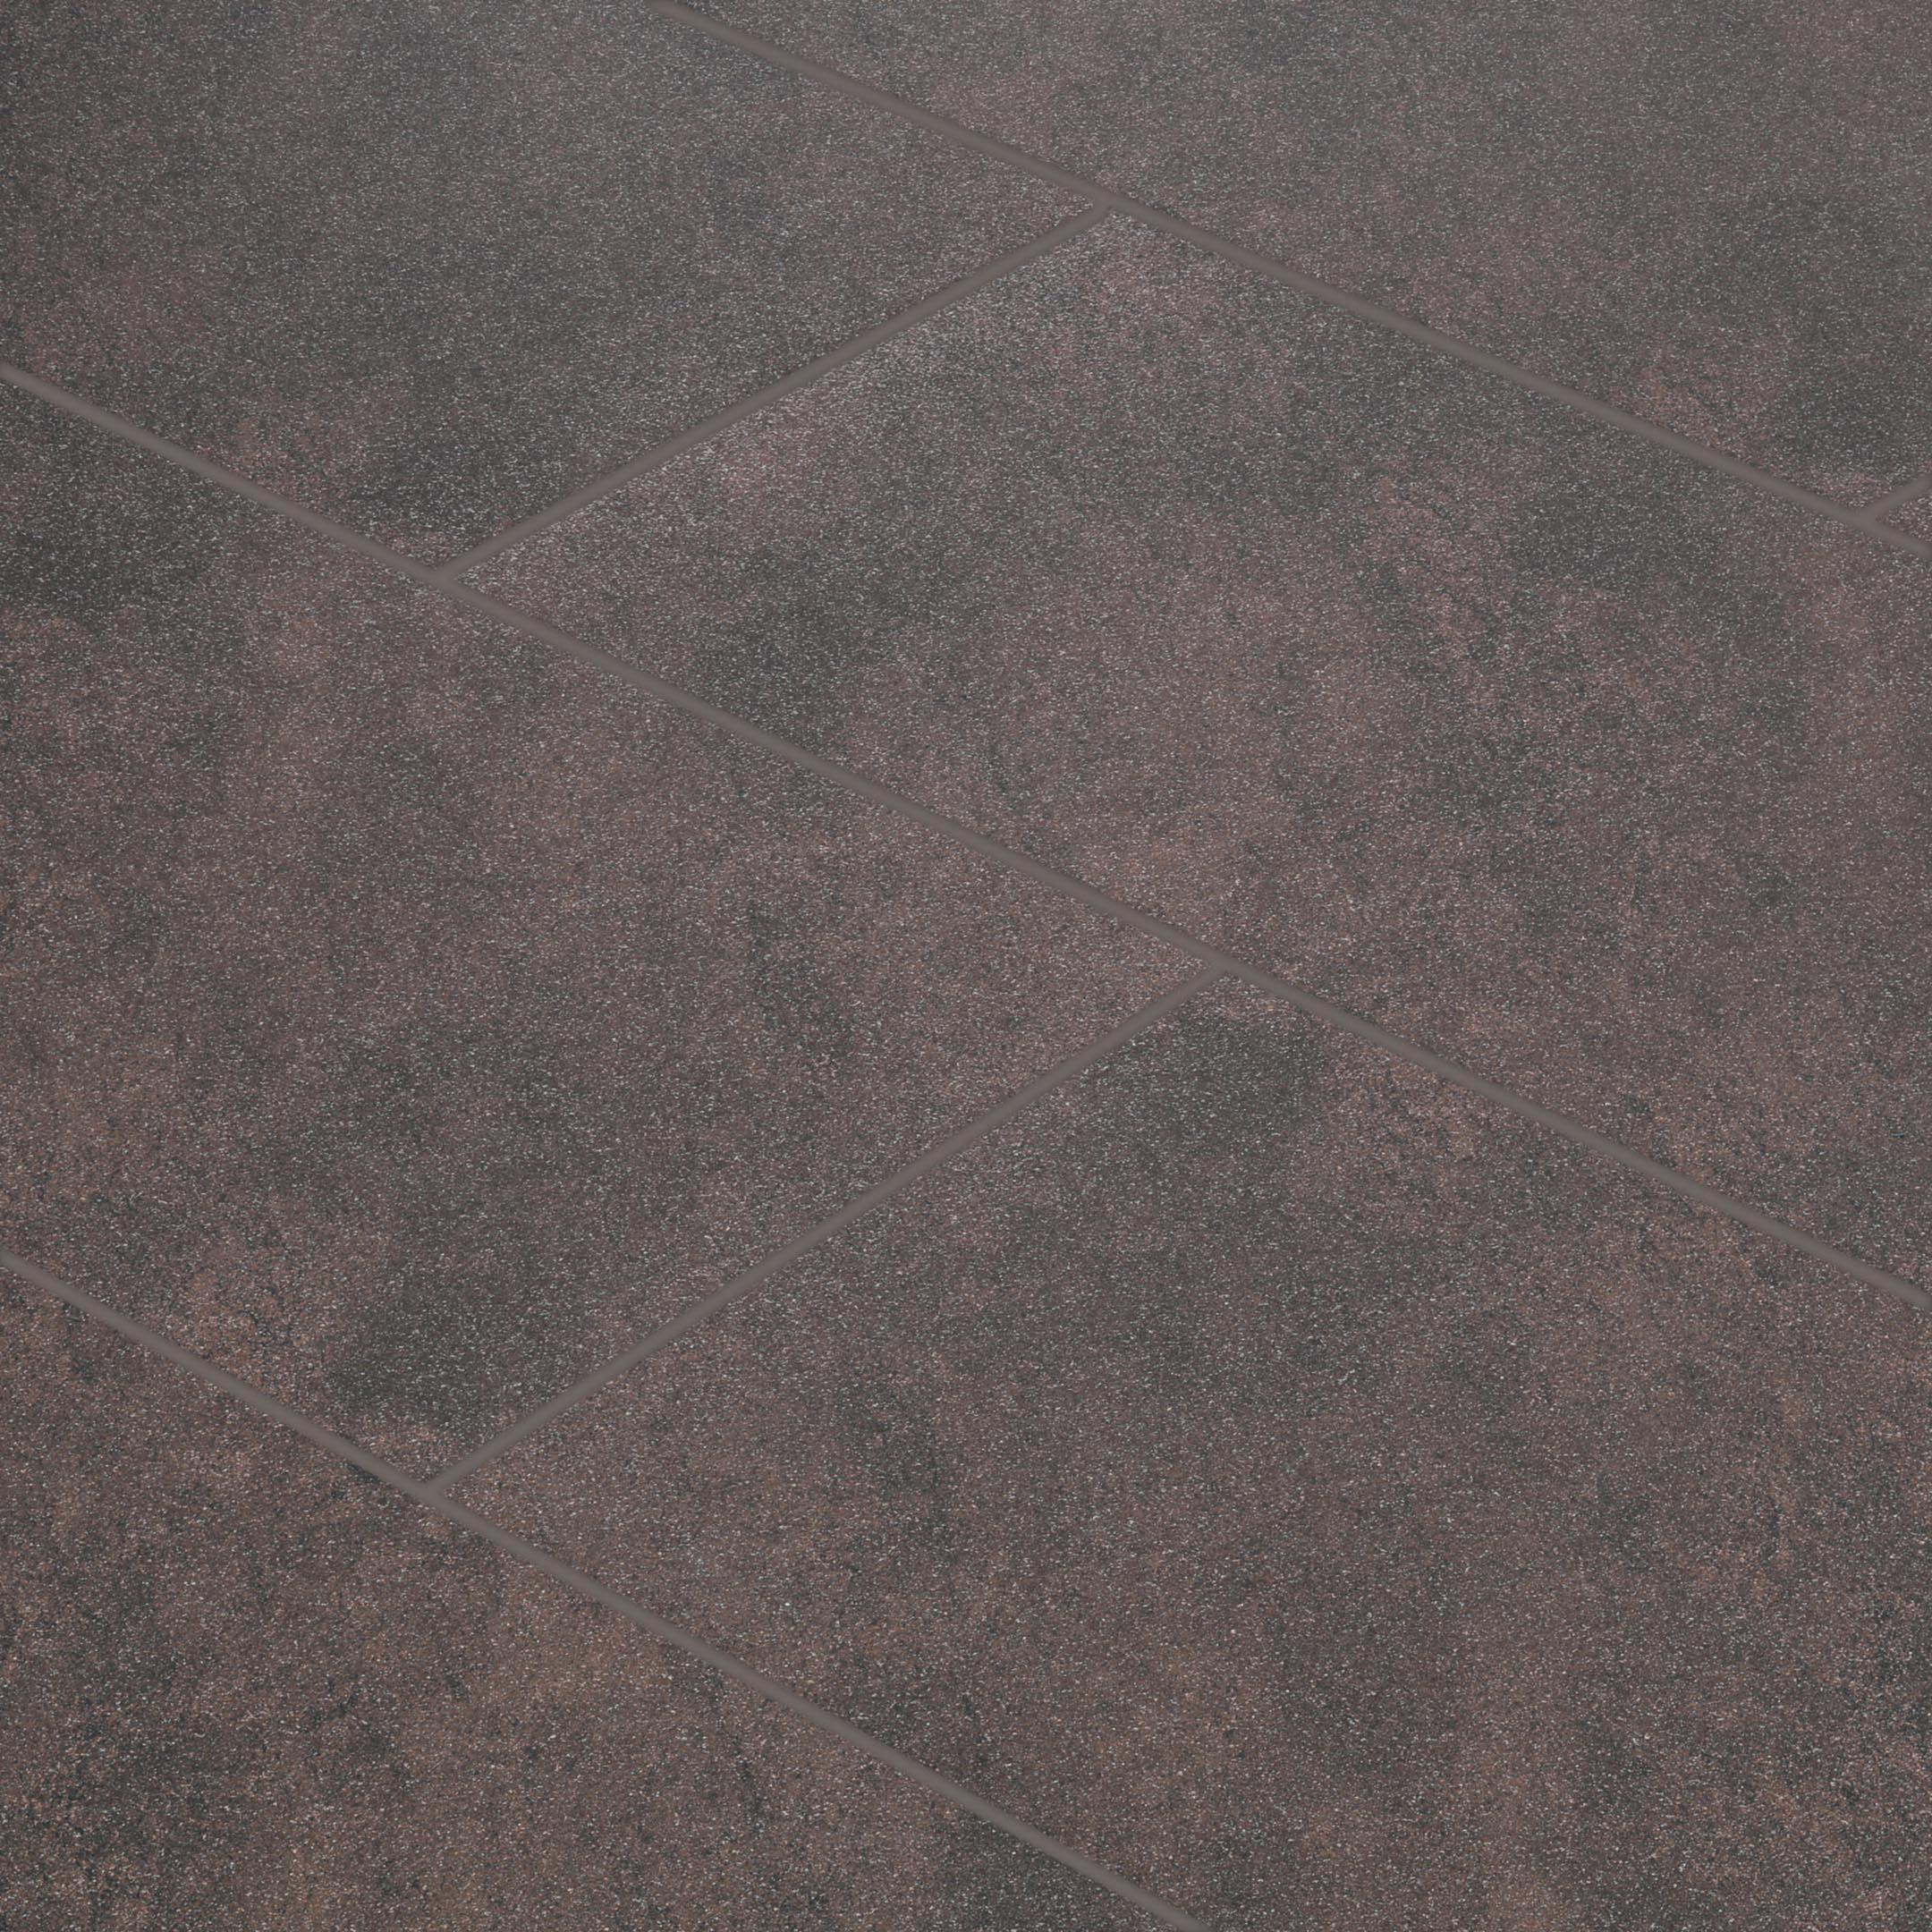 Керамогранит Cersanit Orion коричневый 297х598х8,5 мм (9 шт.=1,6 кв.м)